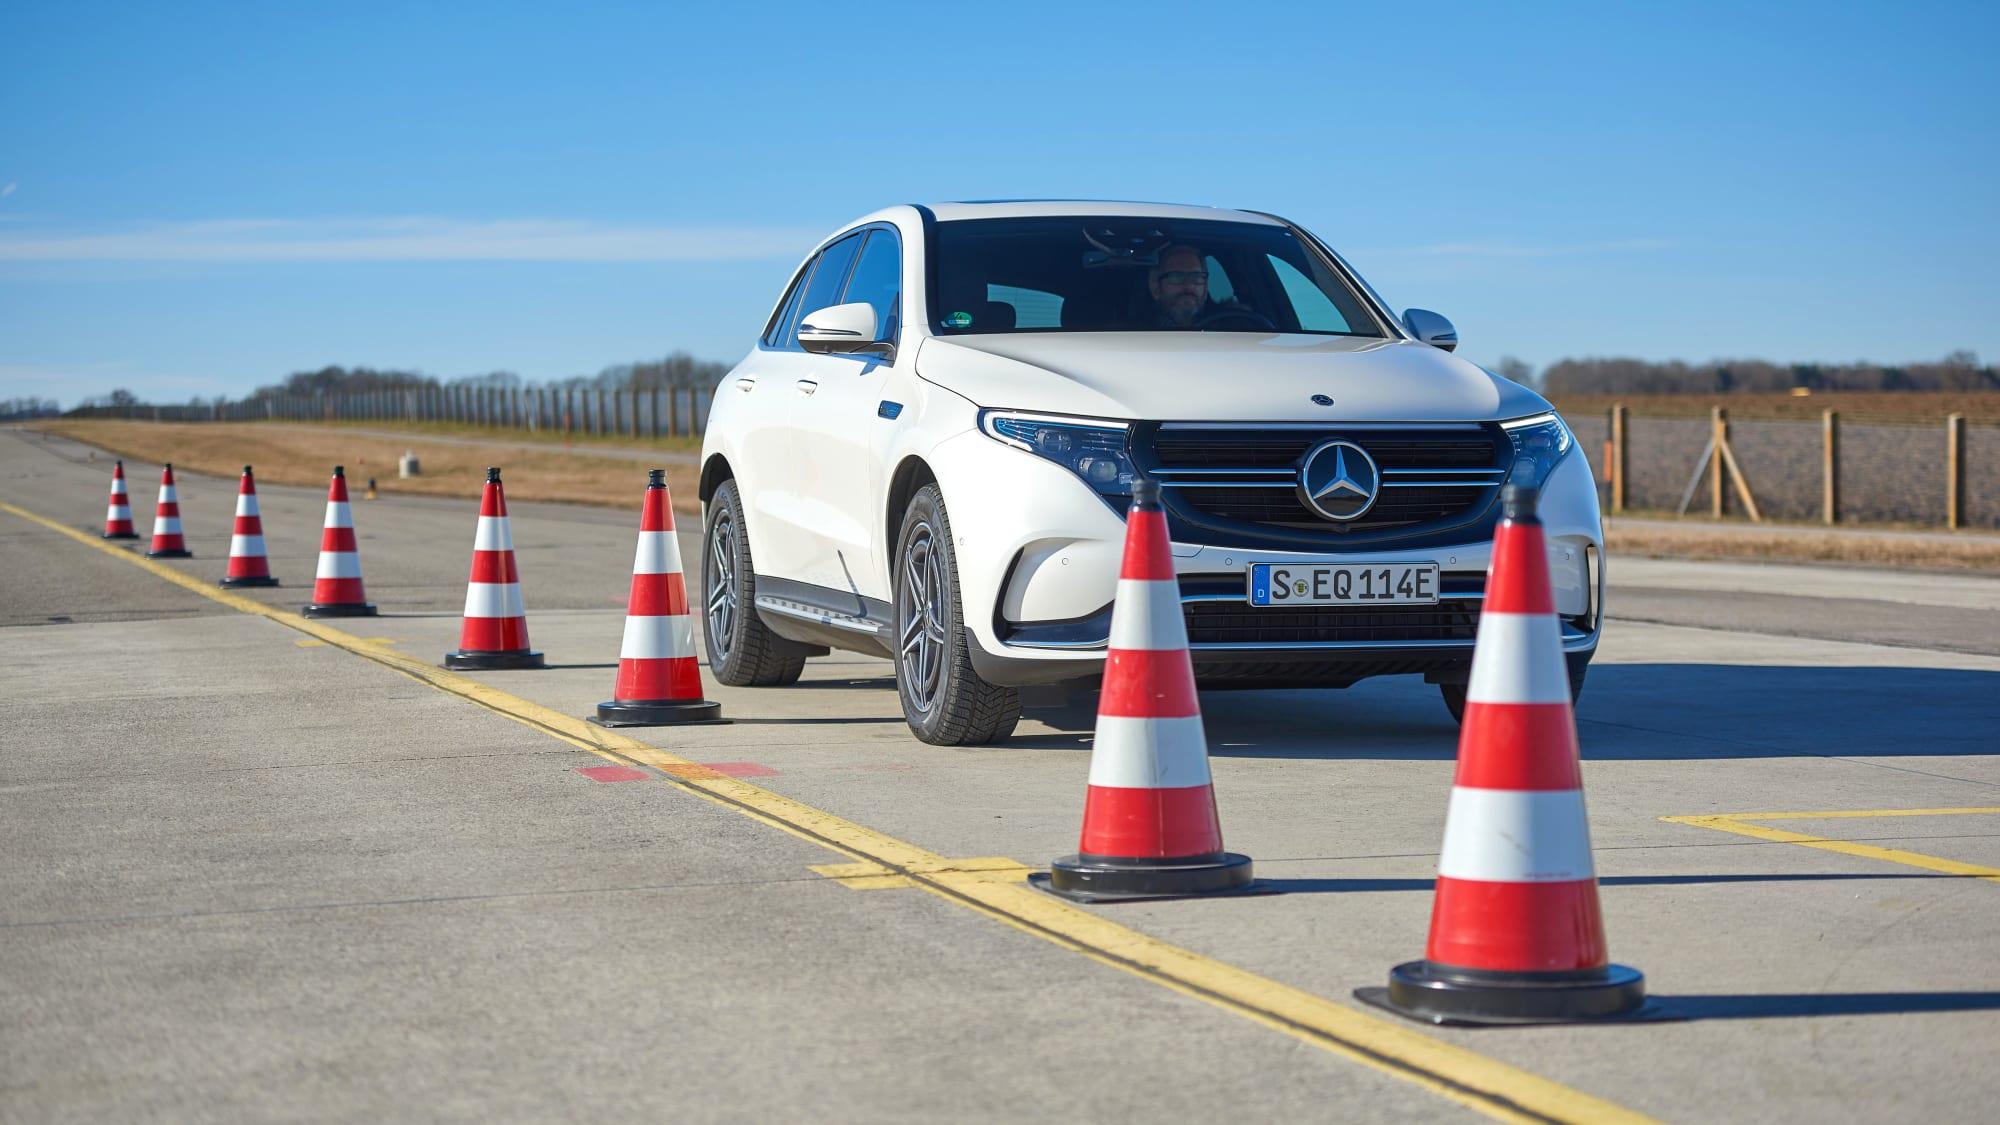 Mercedes EQC fährt neben Pylonen